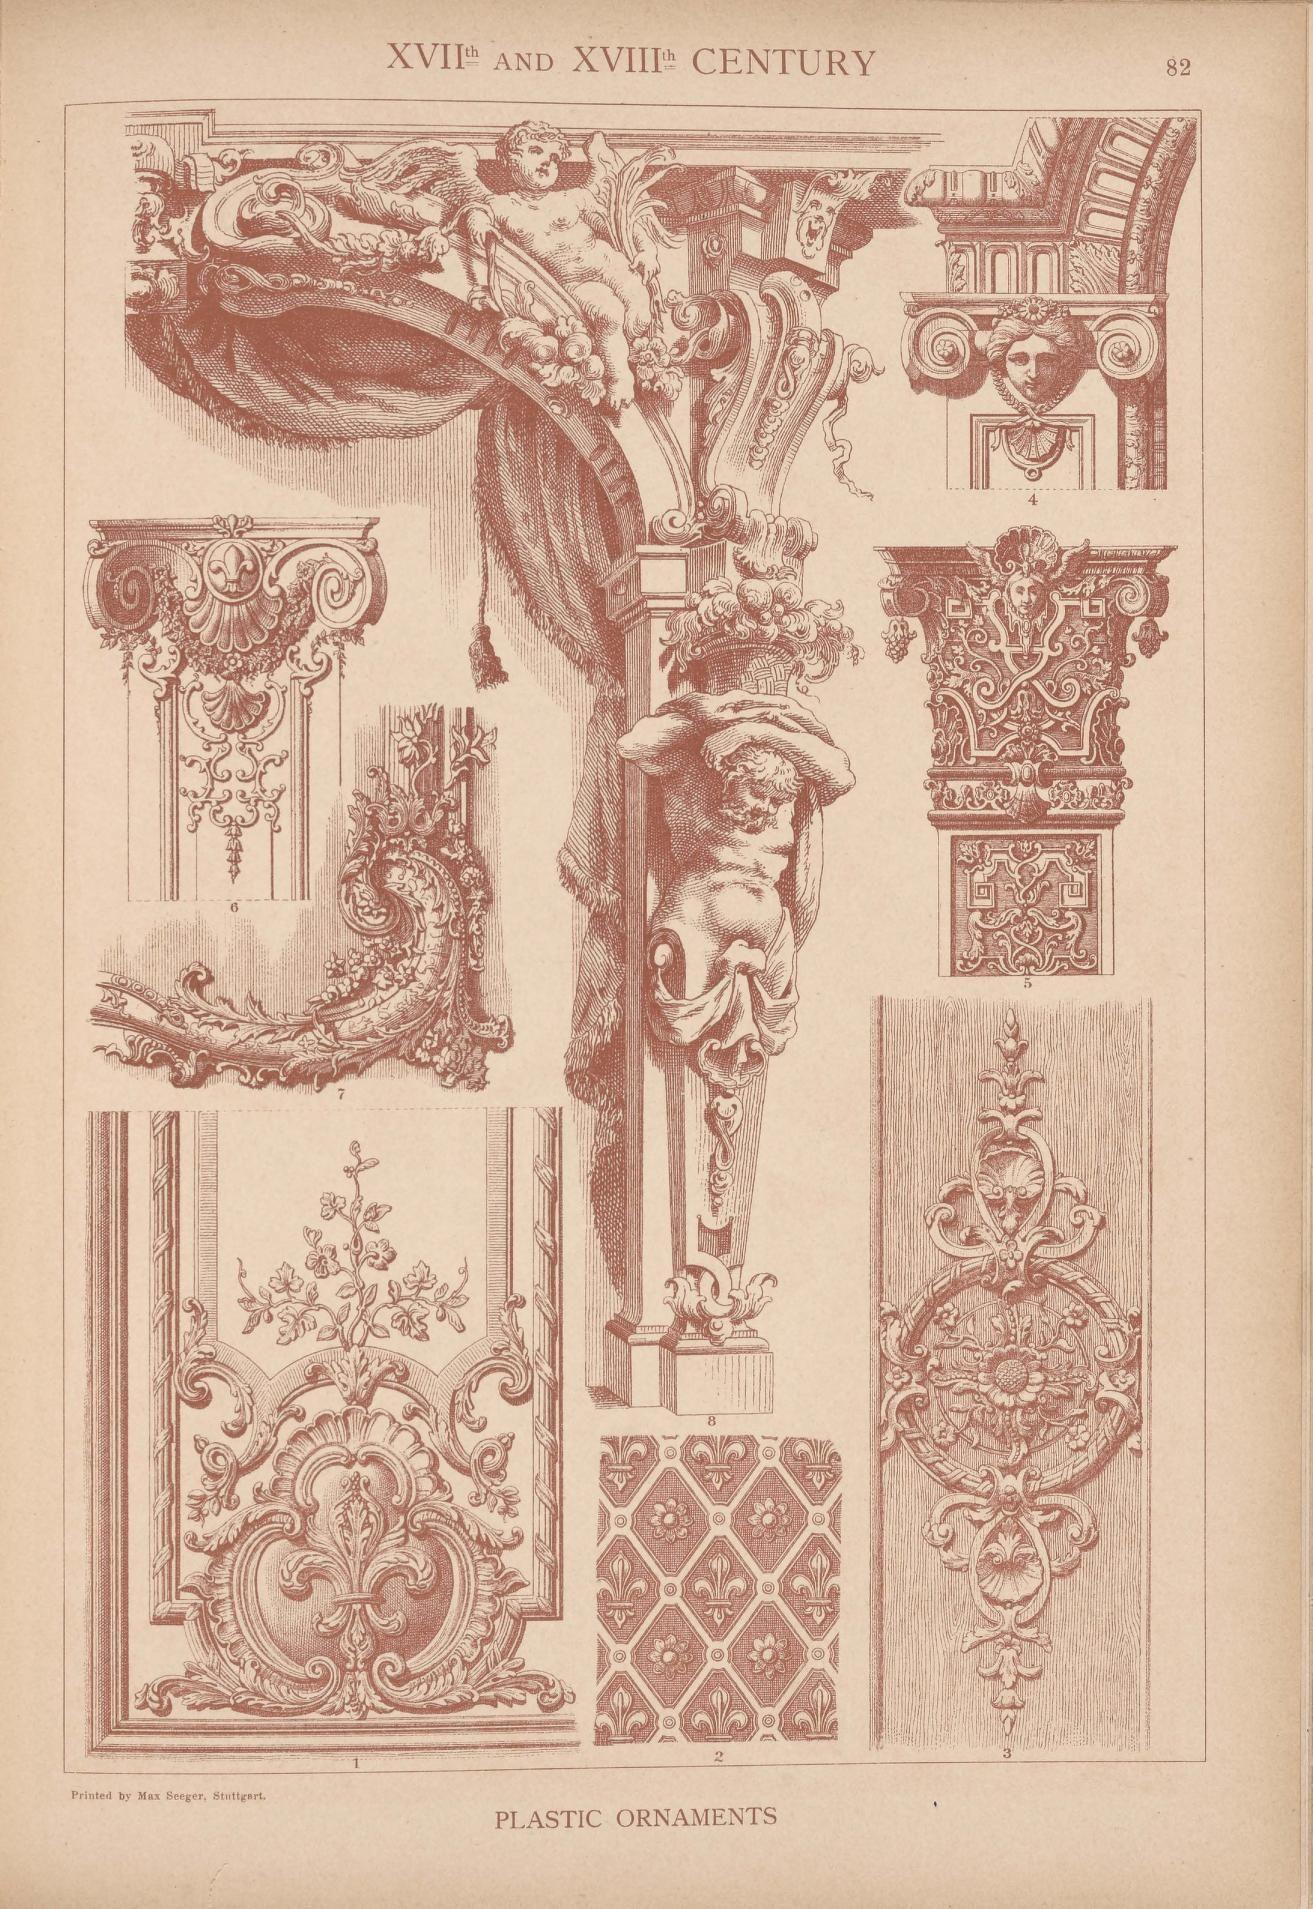 Emil Hochdanz 1816 1885 Xvii Xviii Centuries Historic Styles Of Ornament 1313x1909 Architecture Drawing Architecture Art Baroque Architecture